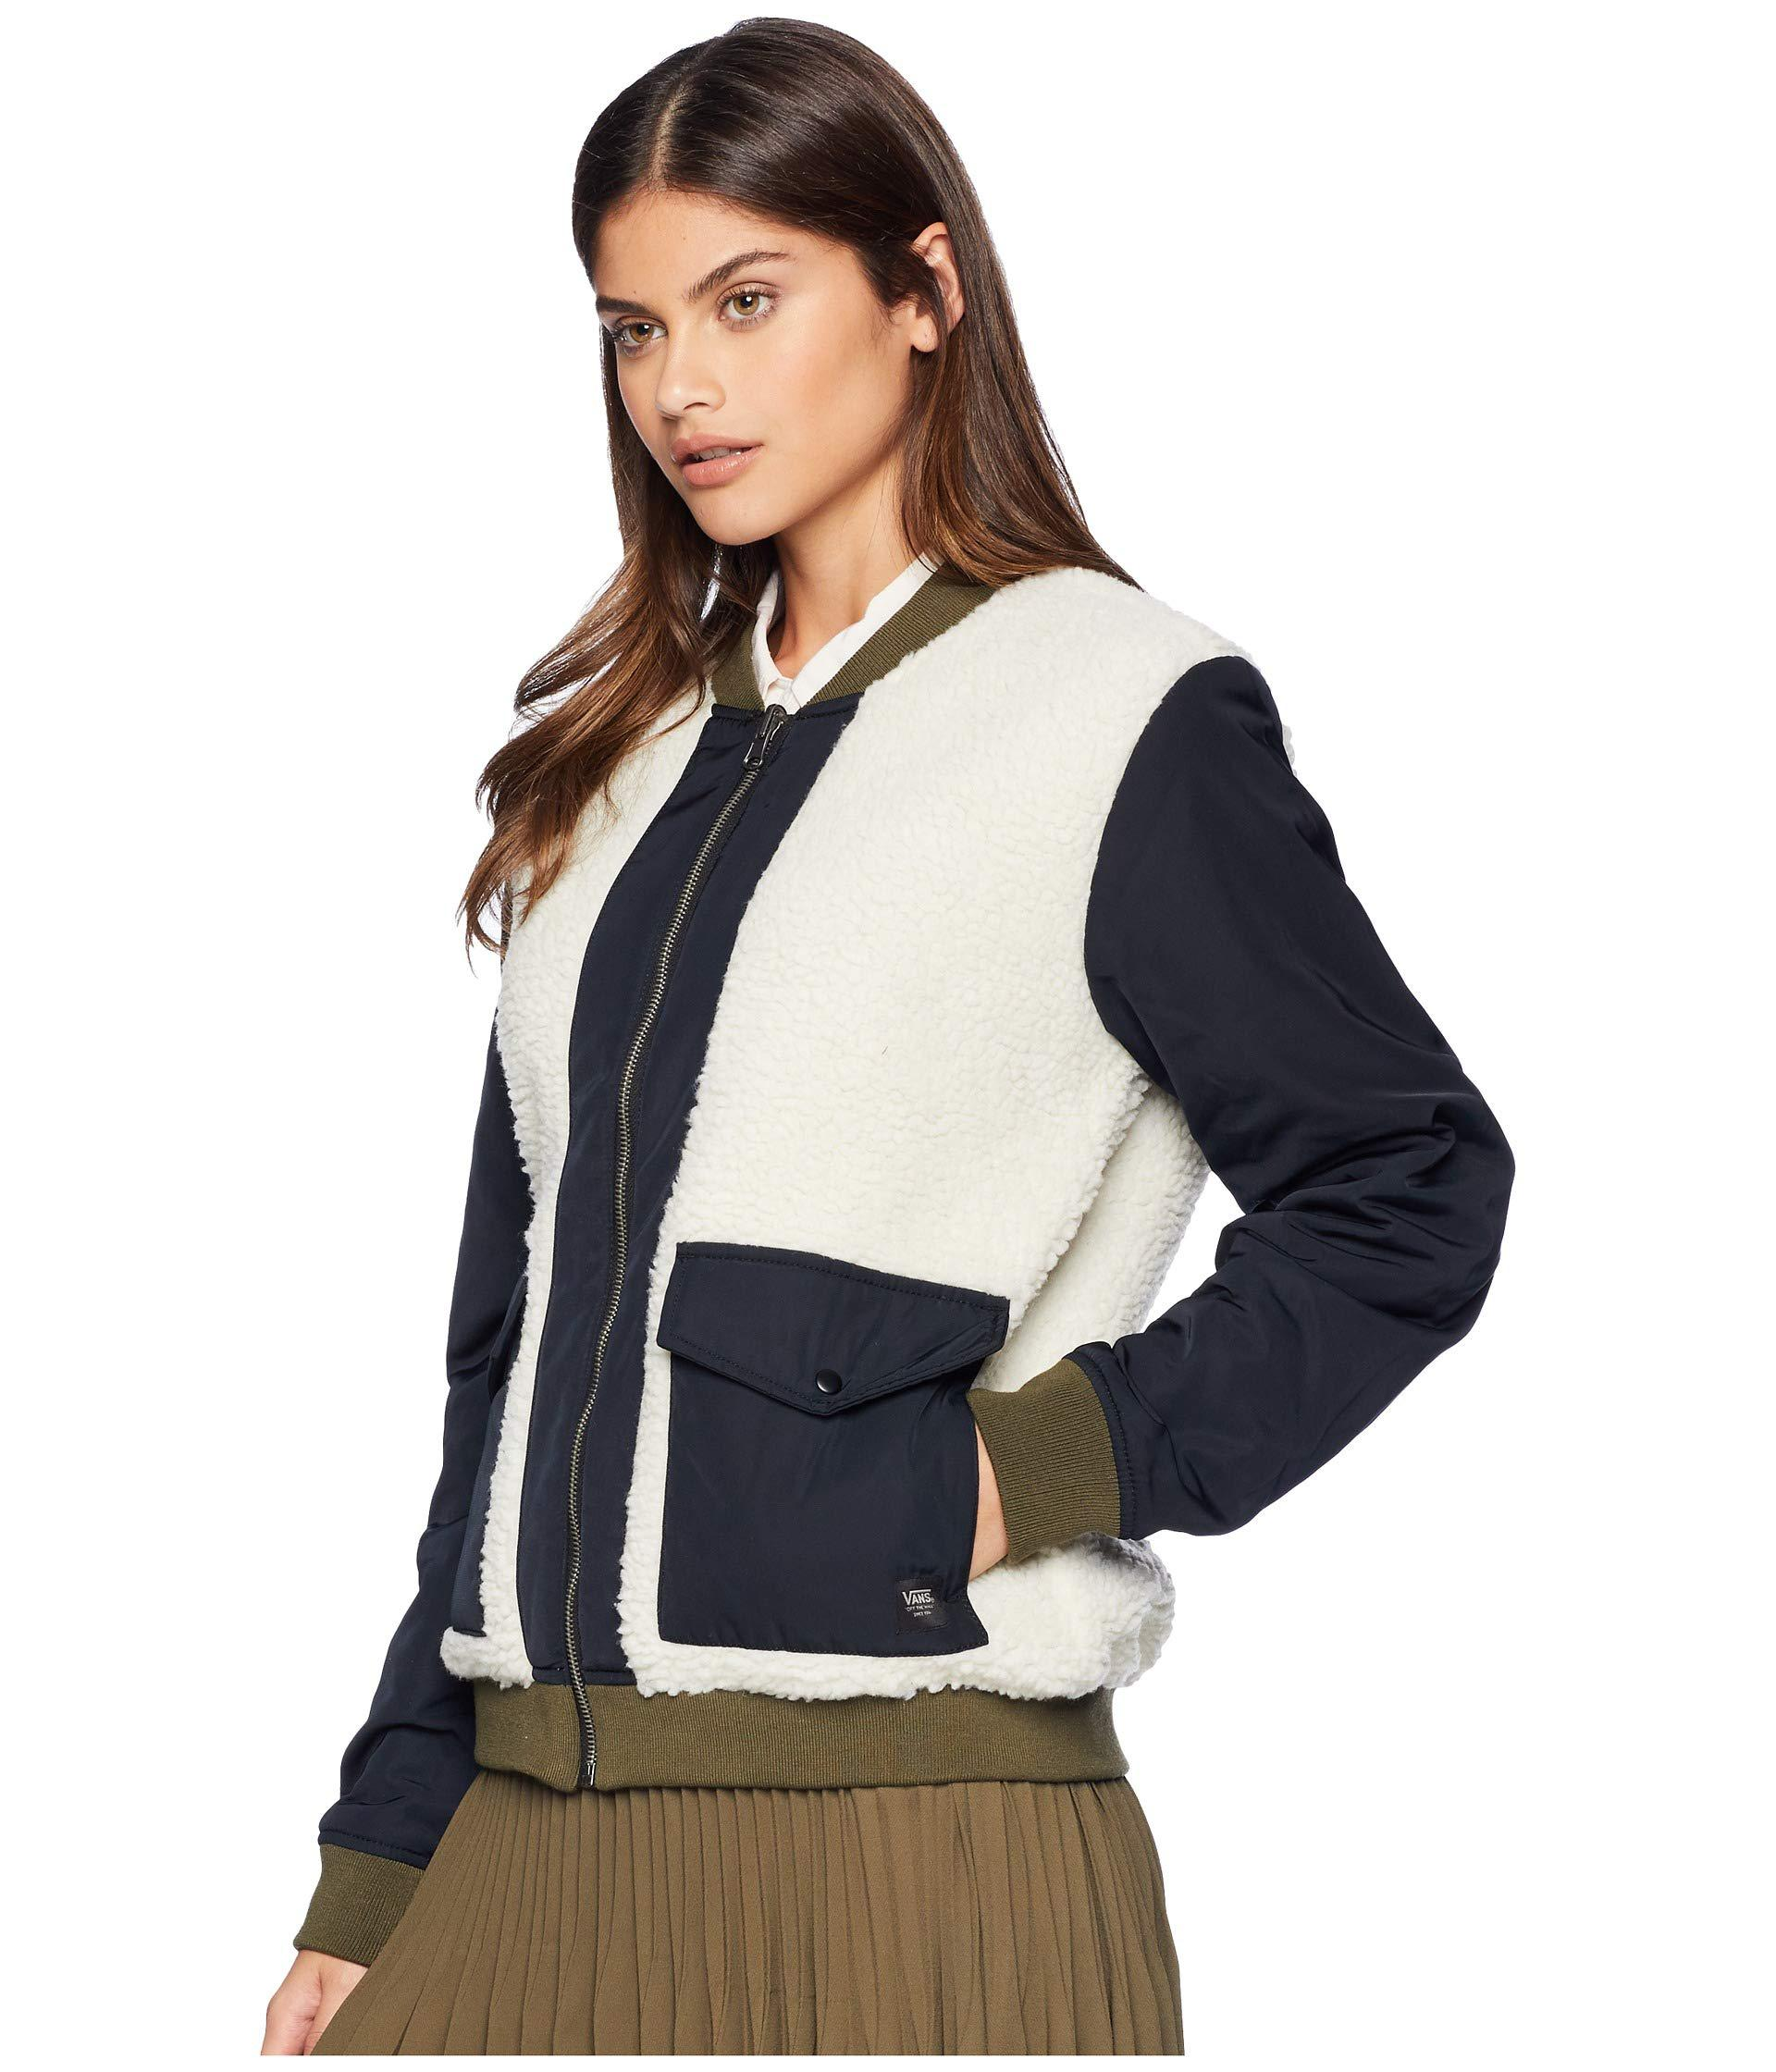 Lyst - Vans Maverick Jacket in Blue - Save 33% dc4beb7734